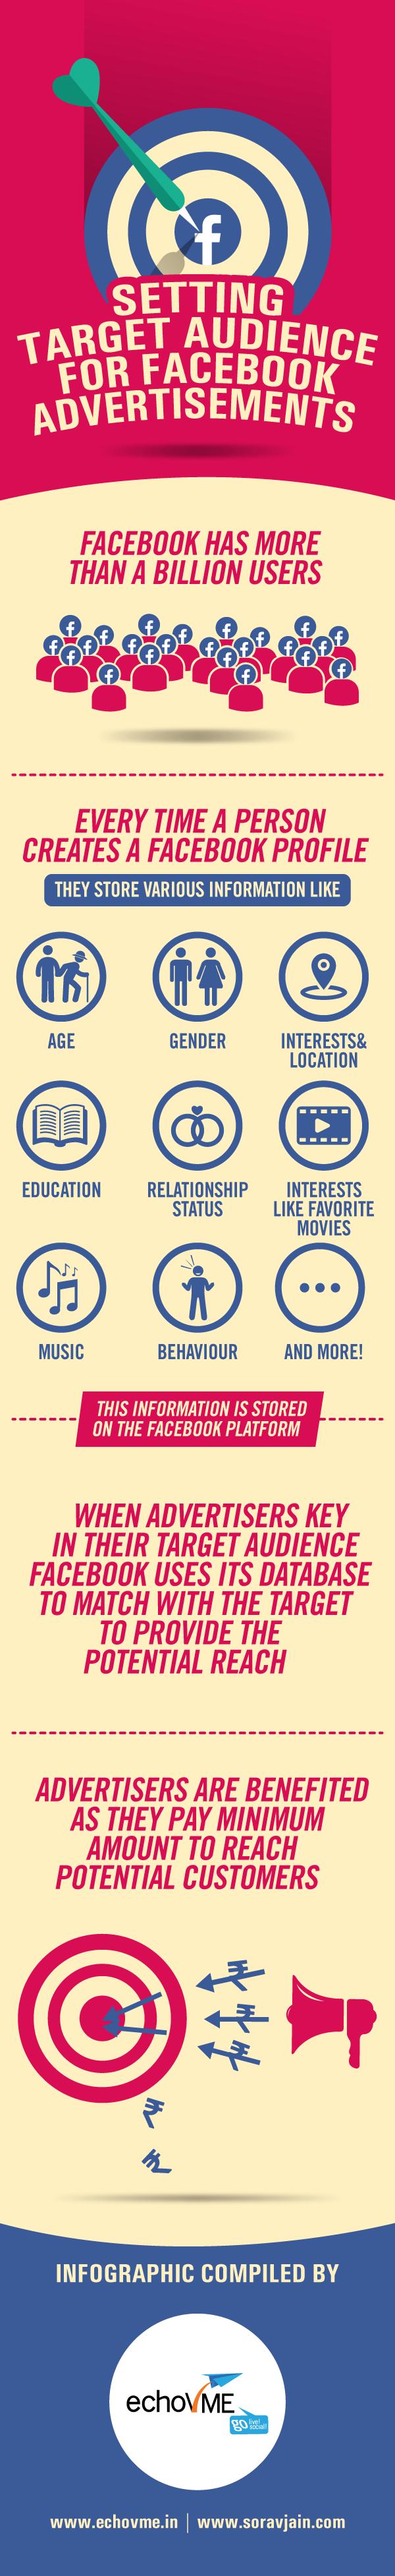 facebook-advertisement-objectives